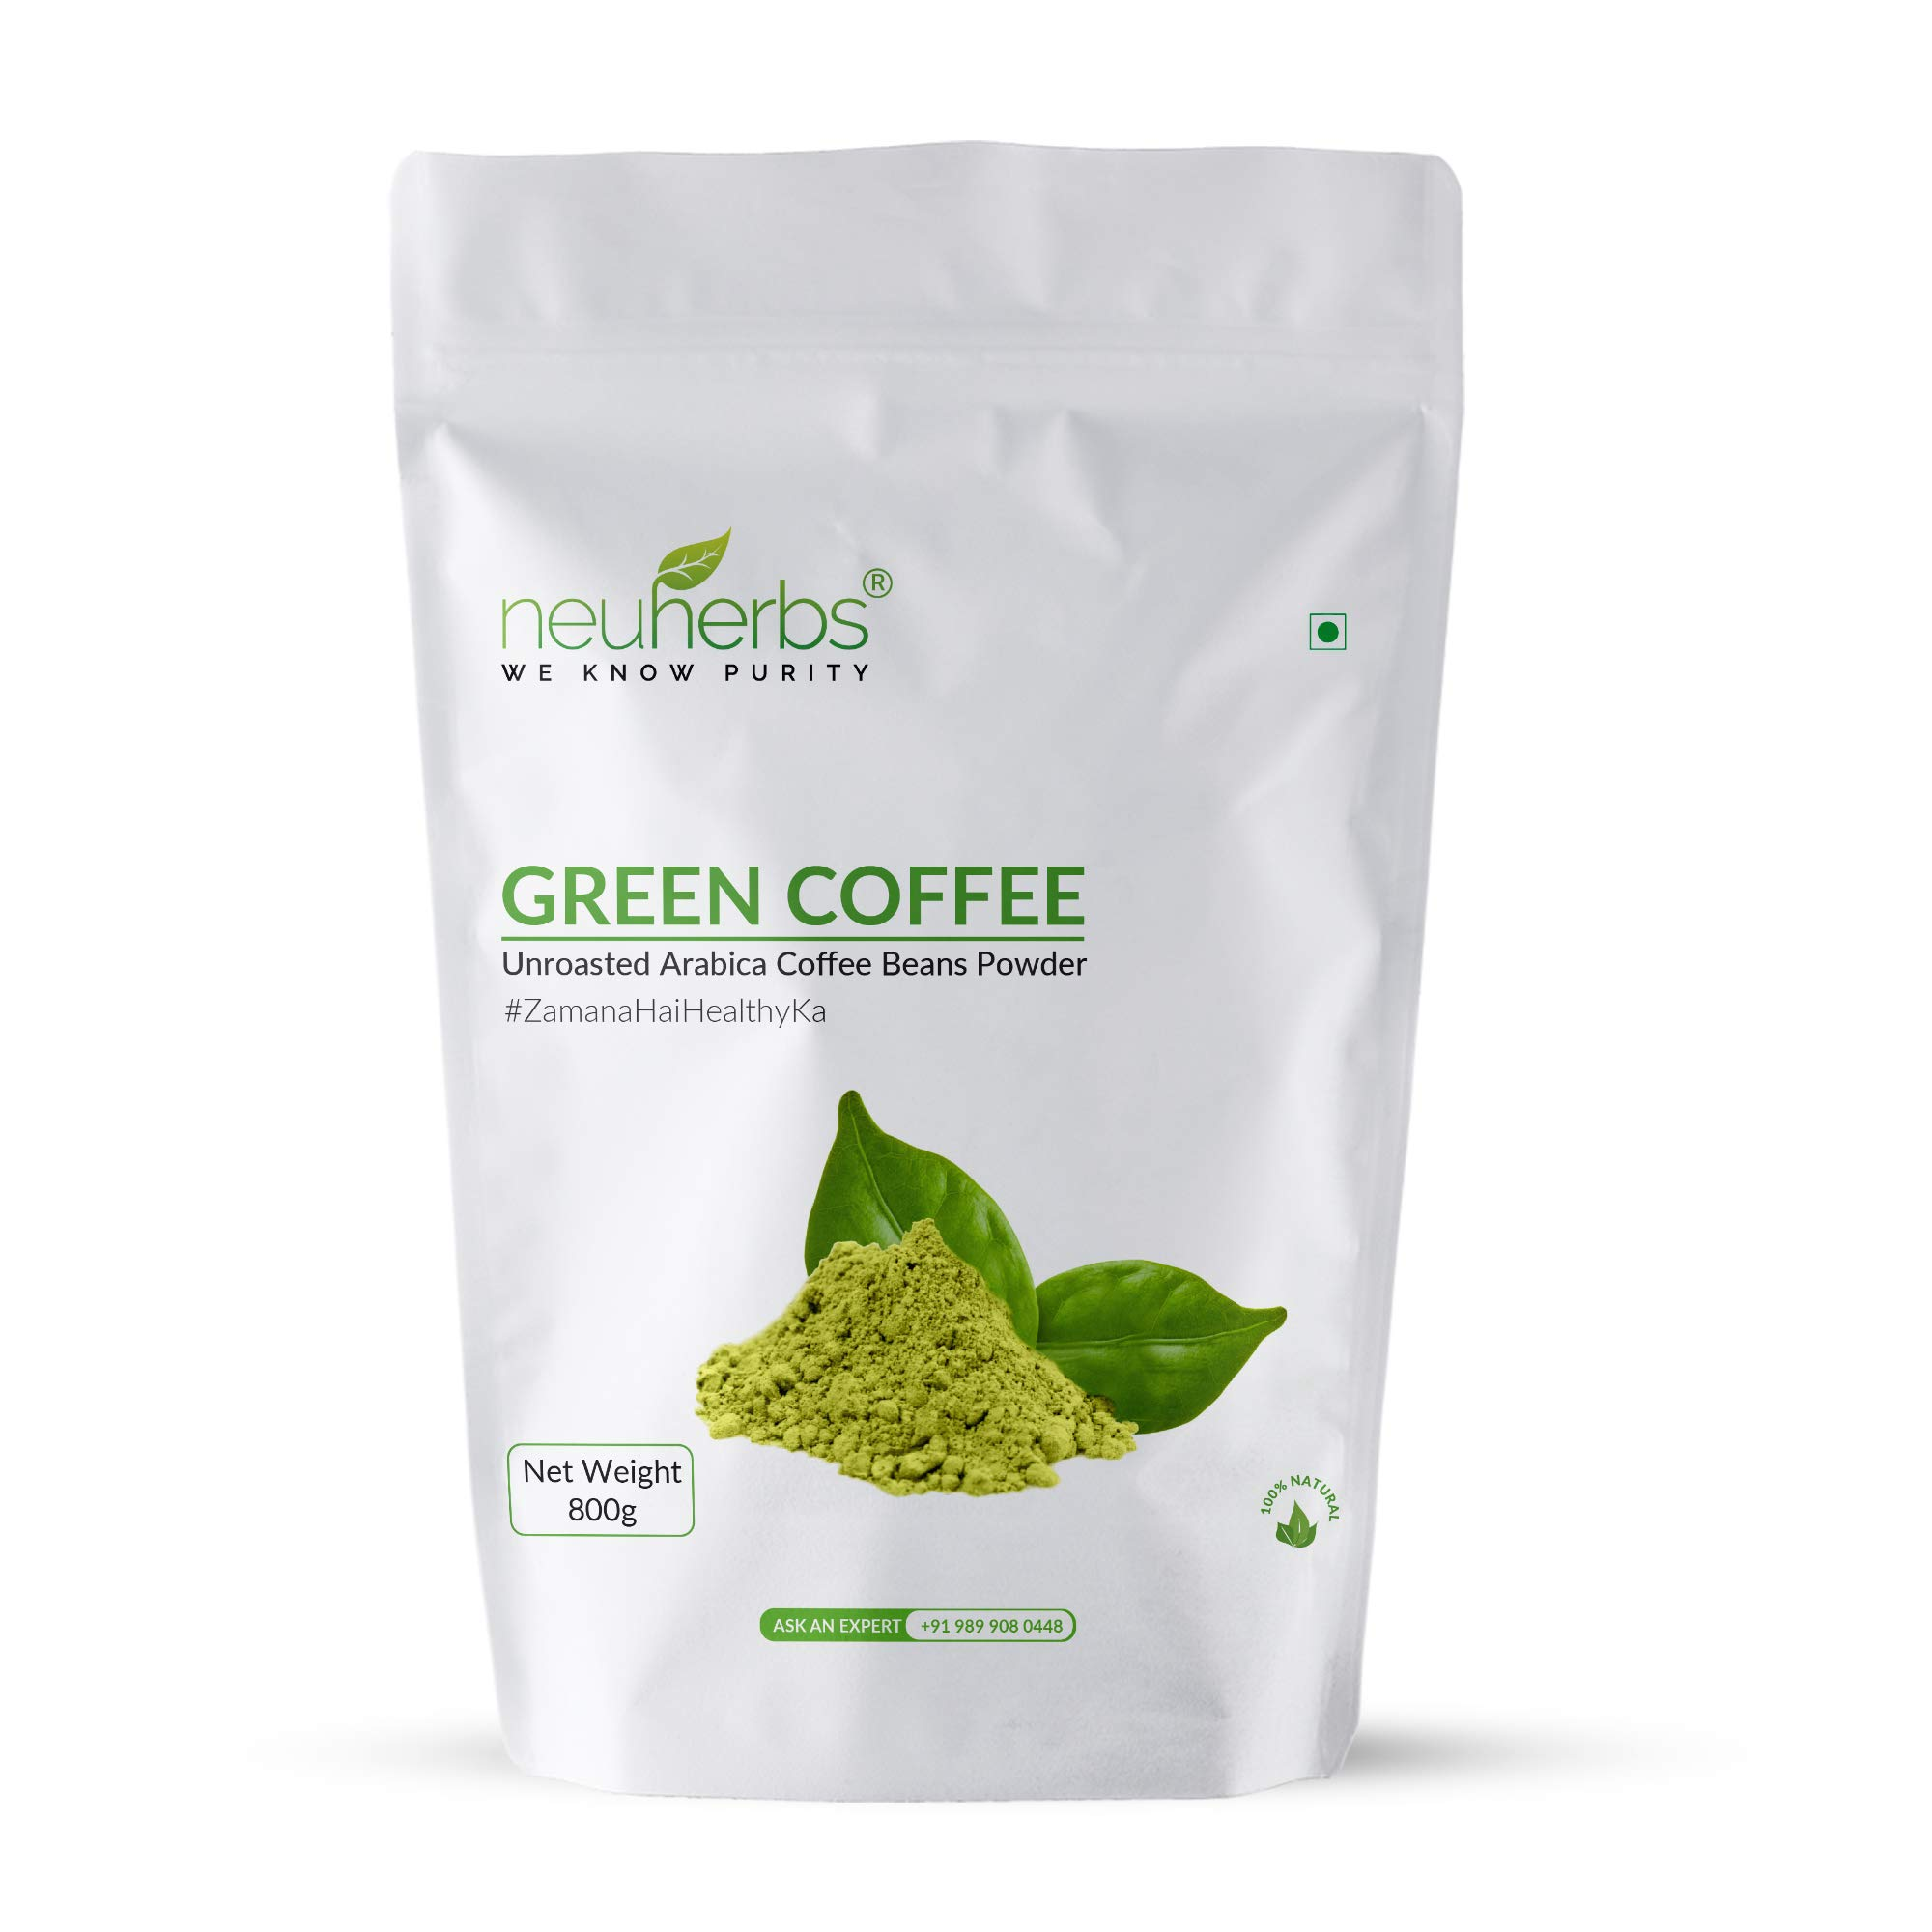 Neuherbs Green Coffee Beans Powder For Weight Loss 800 G Buy